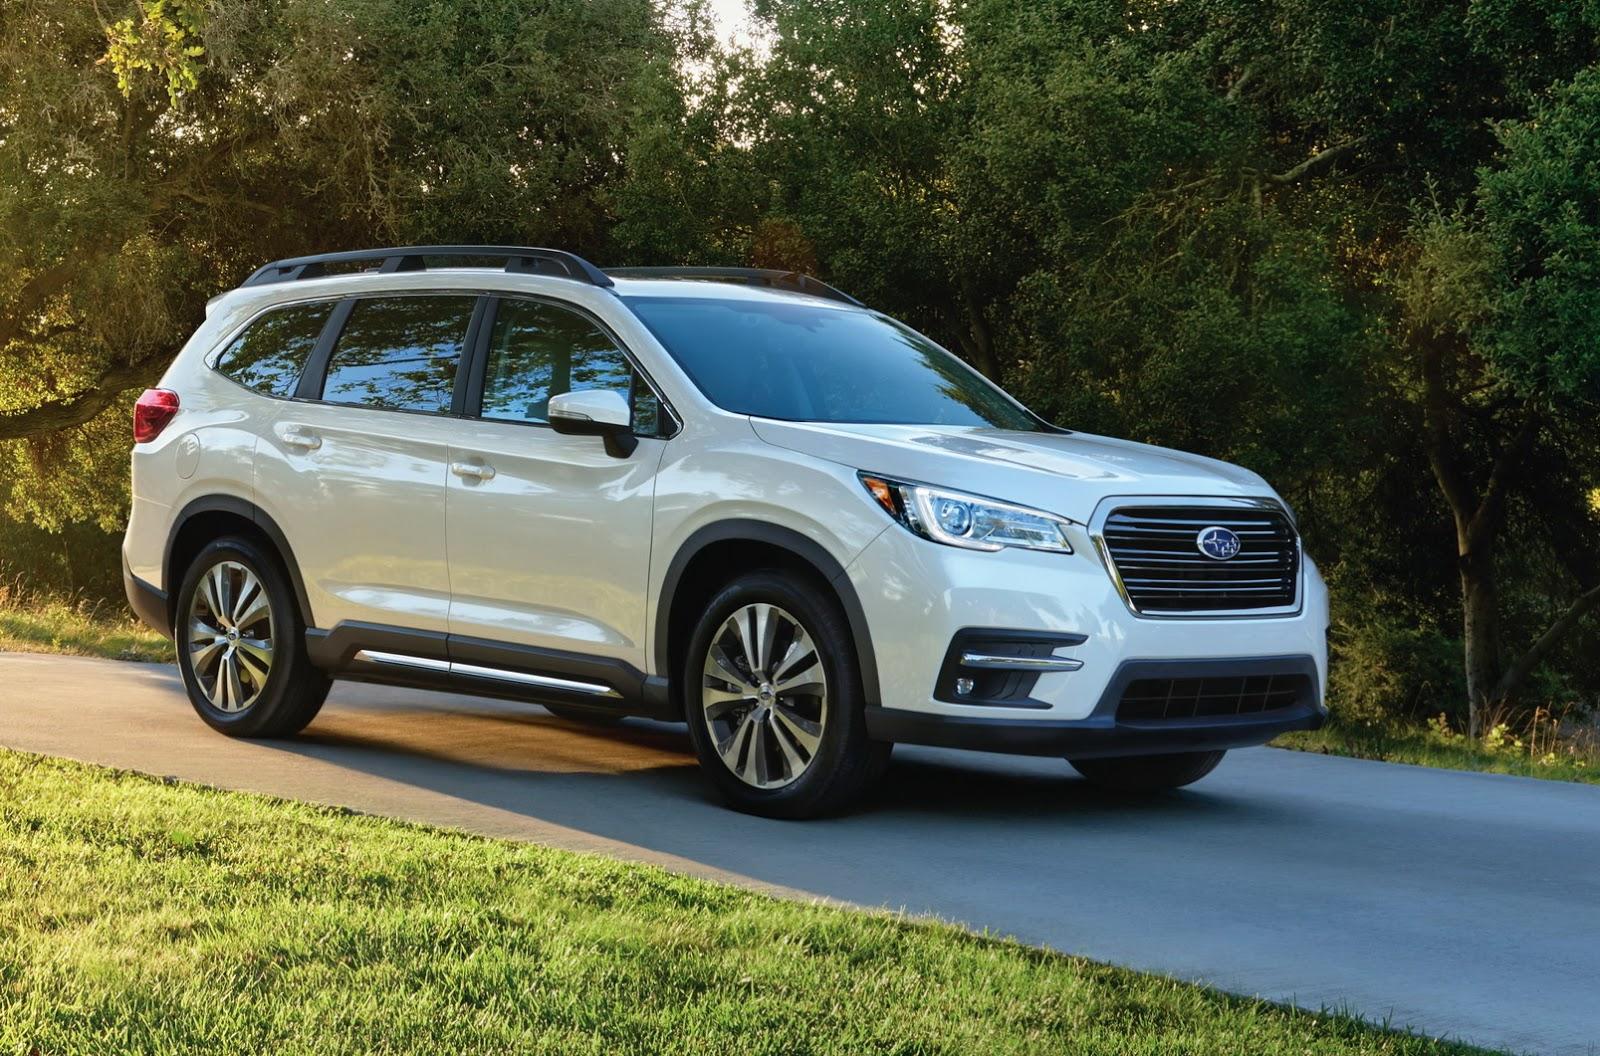 2019 Subaru Ascent Looks Like A Rival For The Honda Pilot